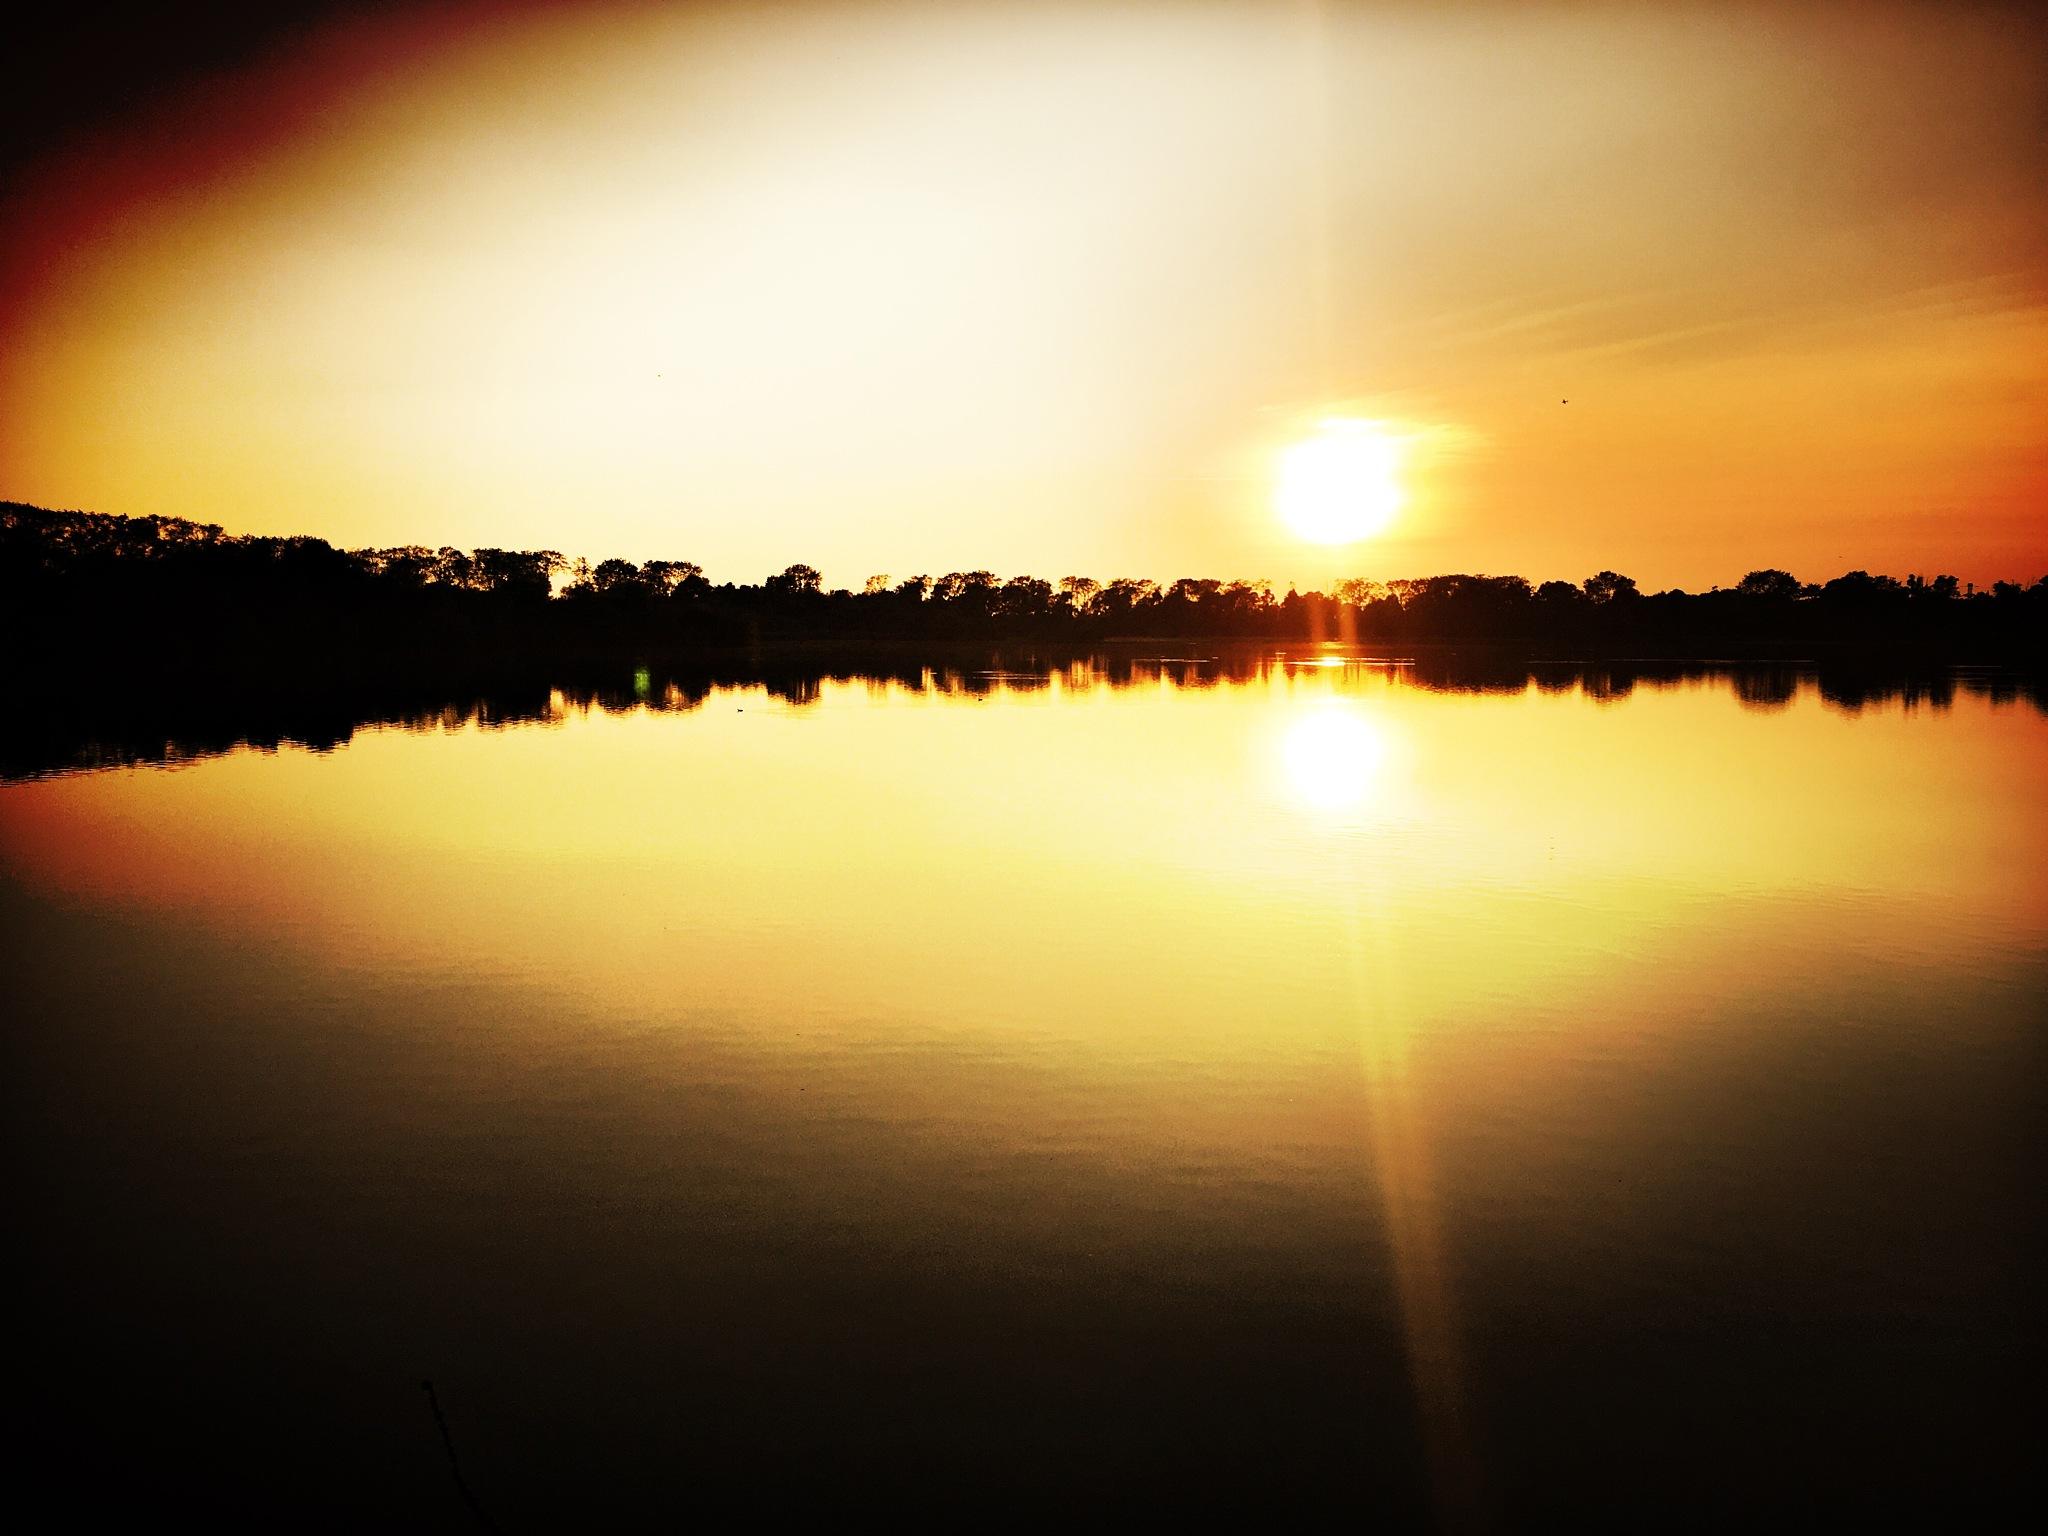 Sunset by Nik Phot